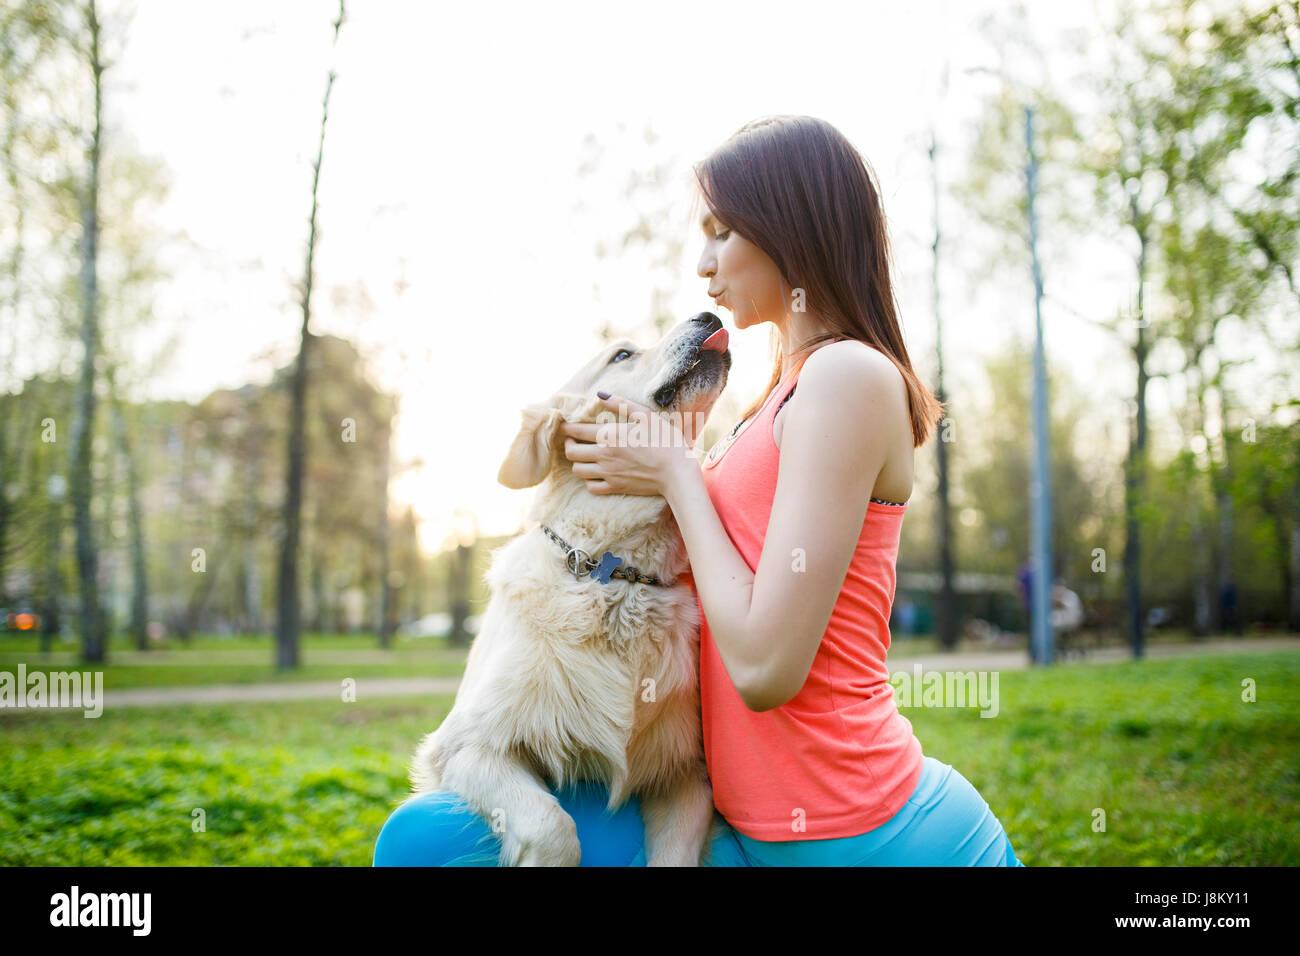 Frau umarmt Hund auf Wiese Stockbild